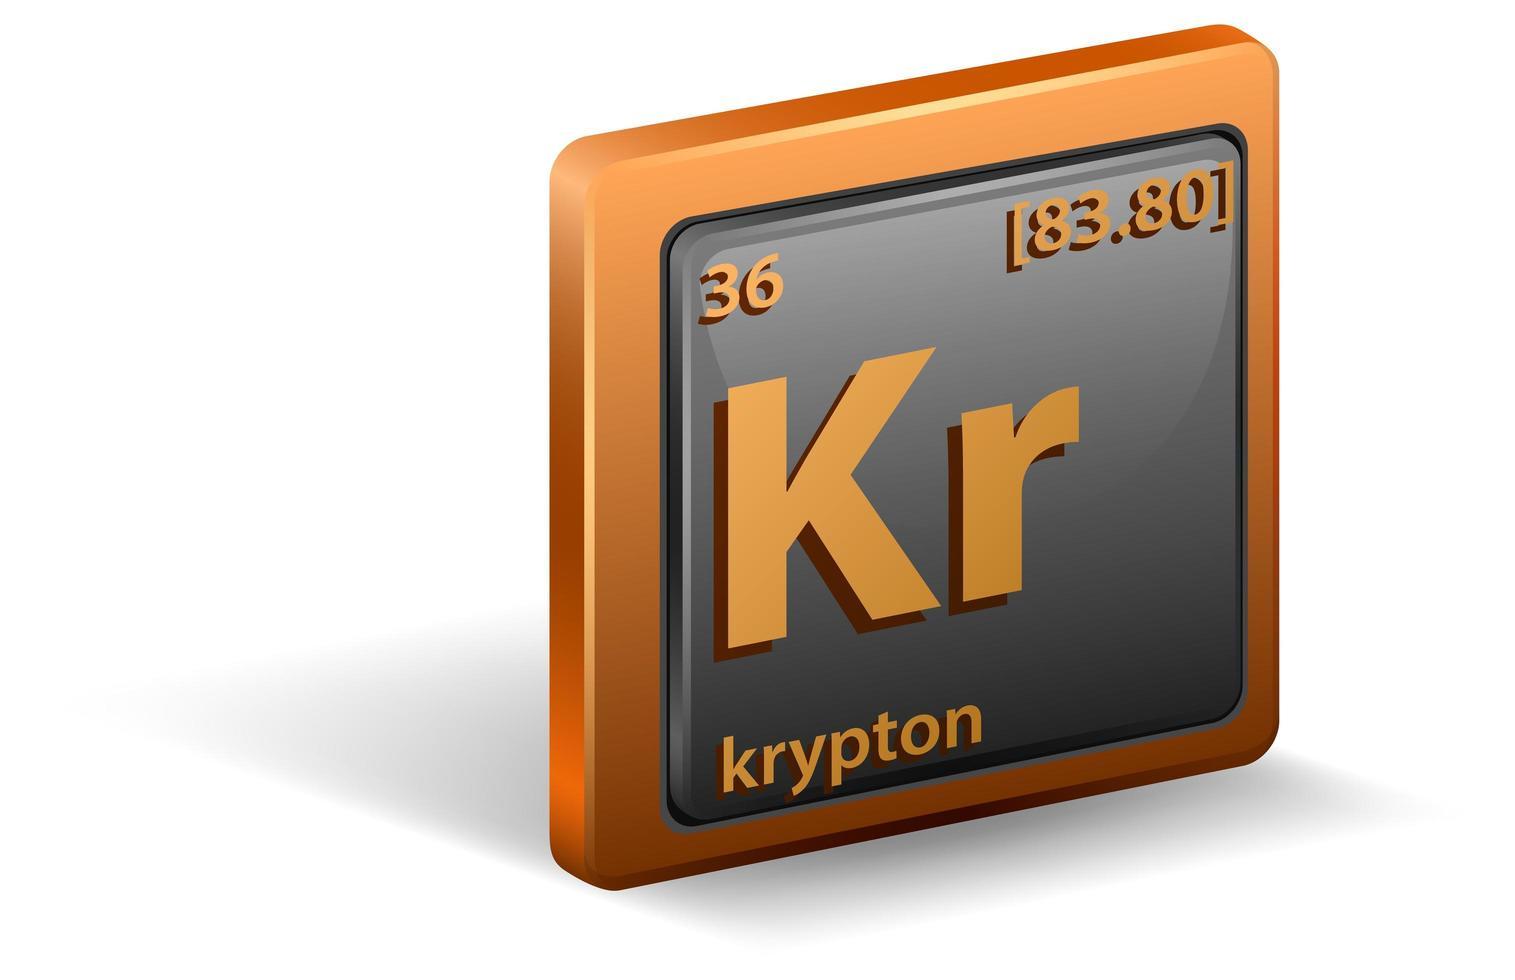 krypton scheikundig element. chemisch symbool met atoomnummer en atoommassa. vector